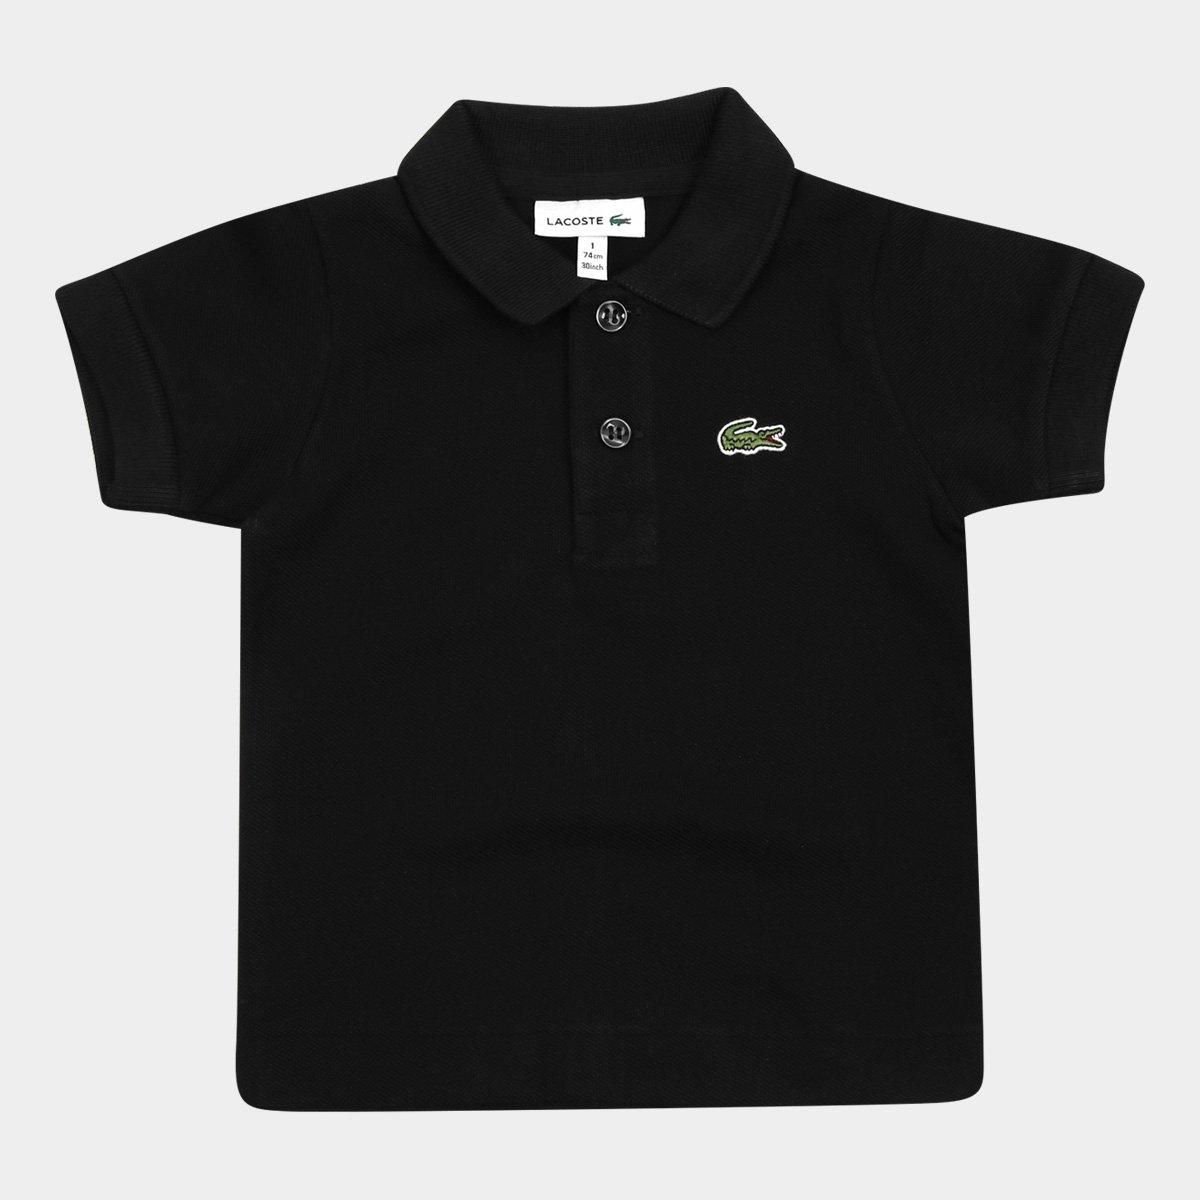 94e37dfb83328 Camisa Polo Infantil Lacoste Masculina - Preto - Compre Agora